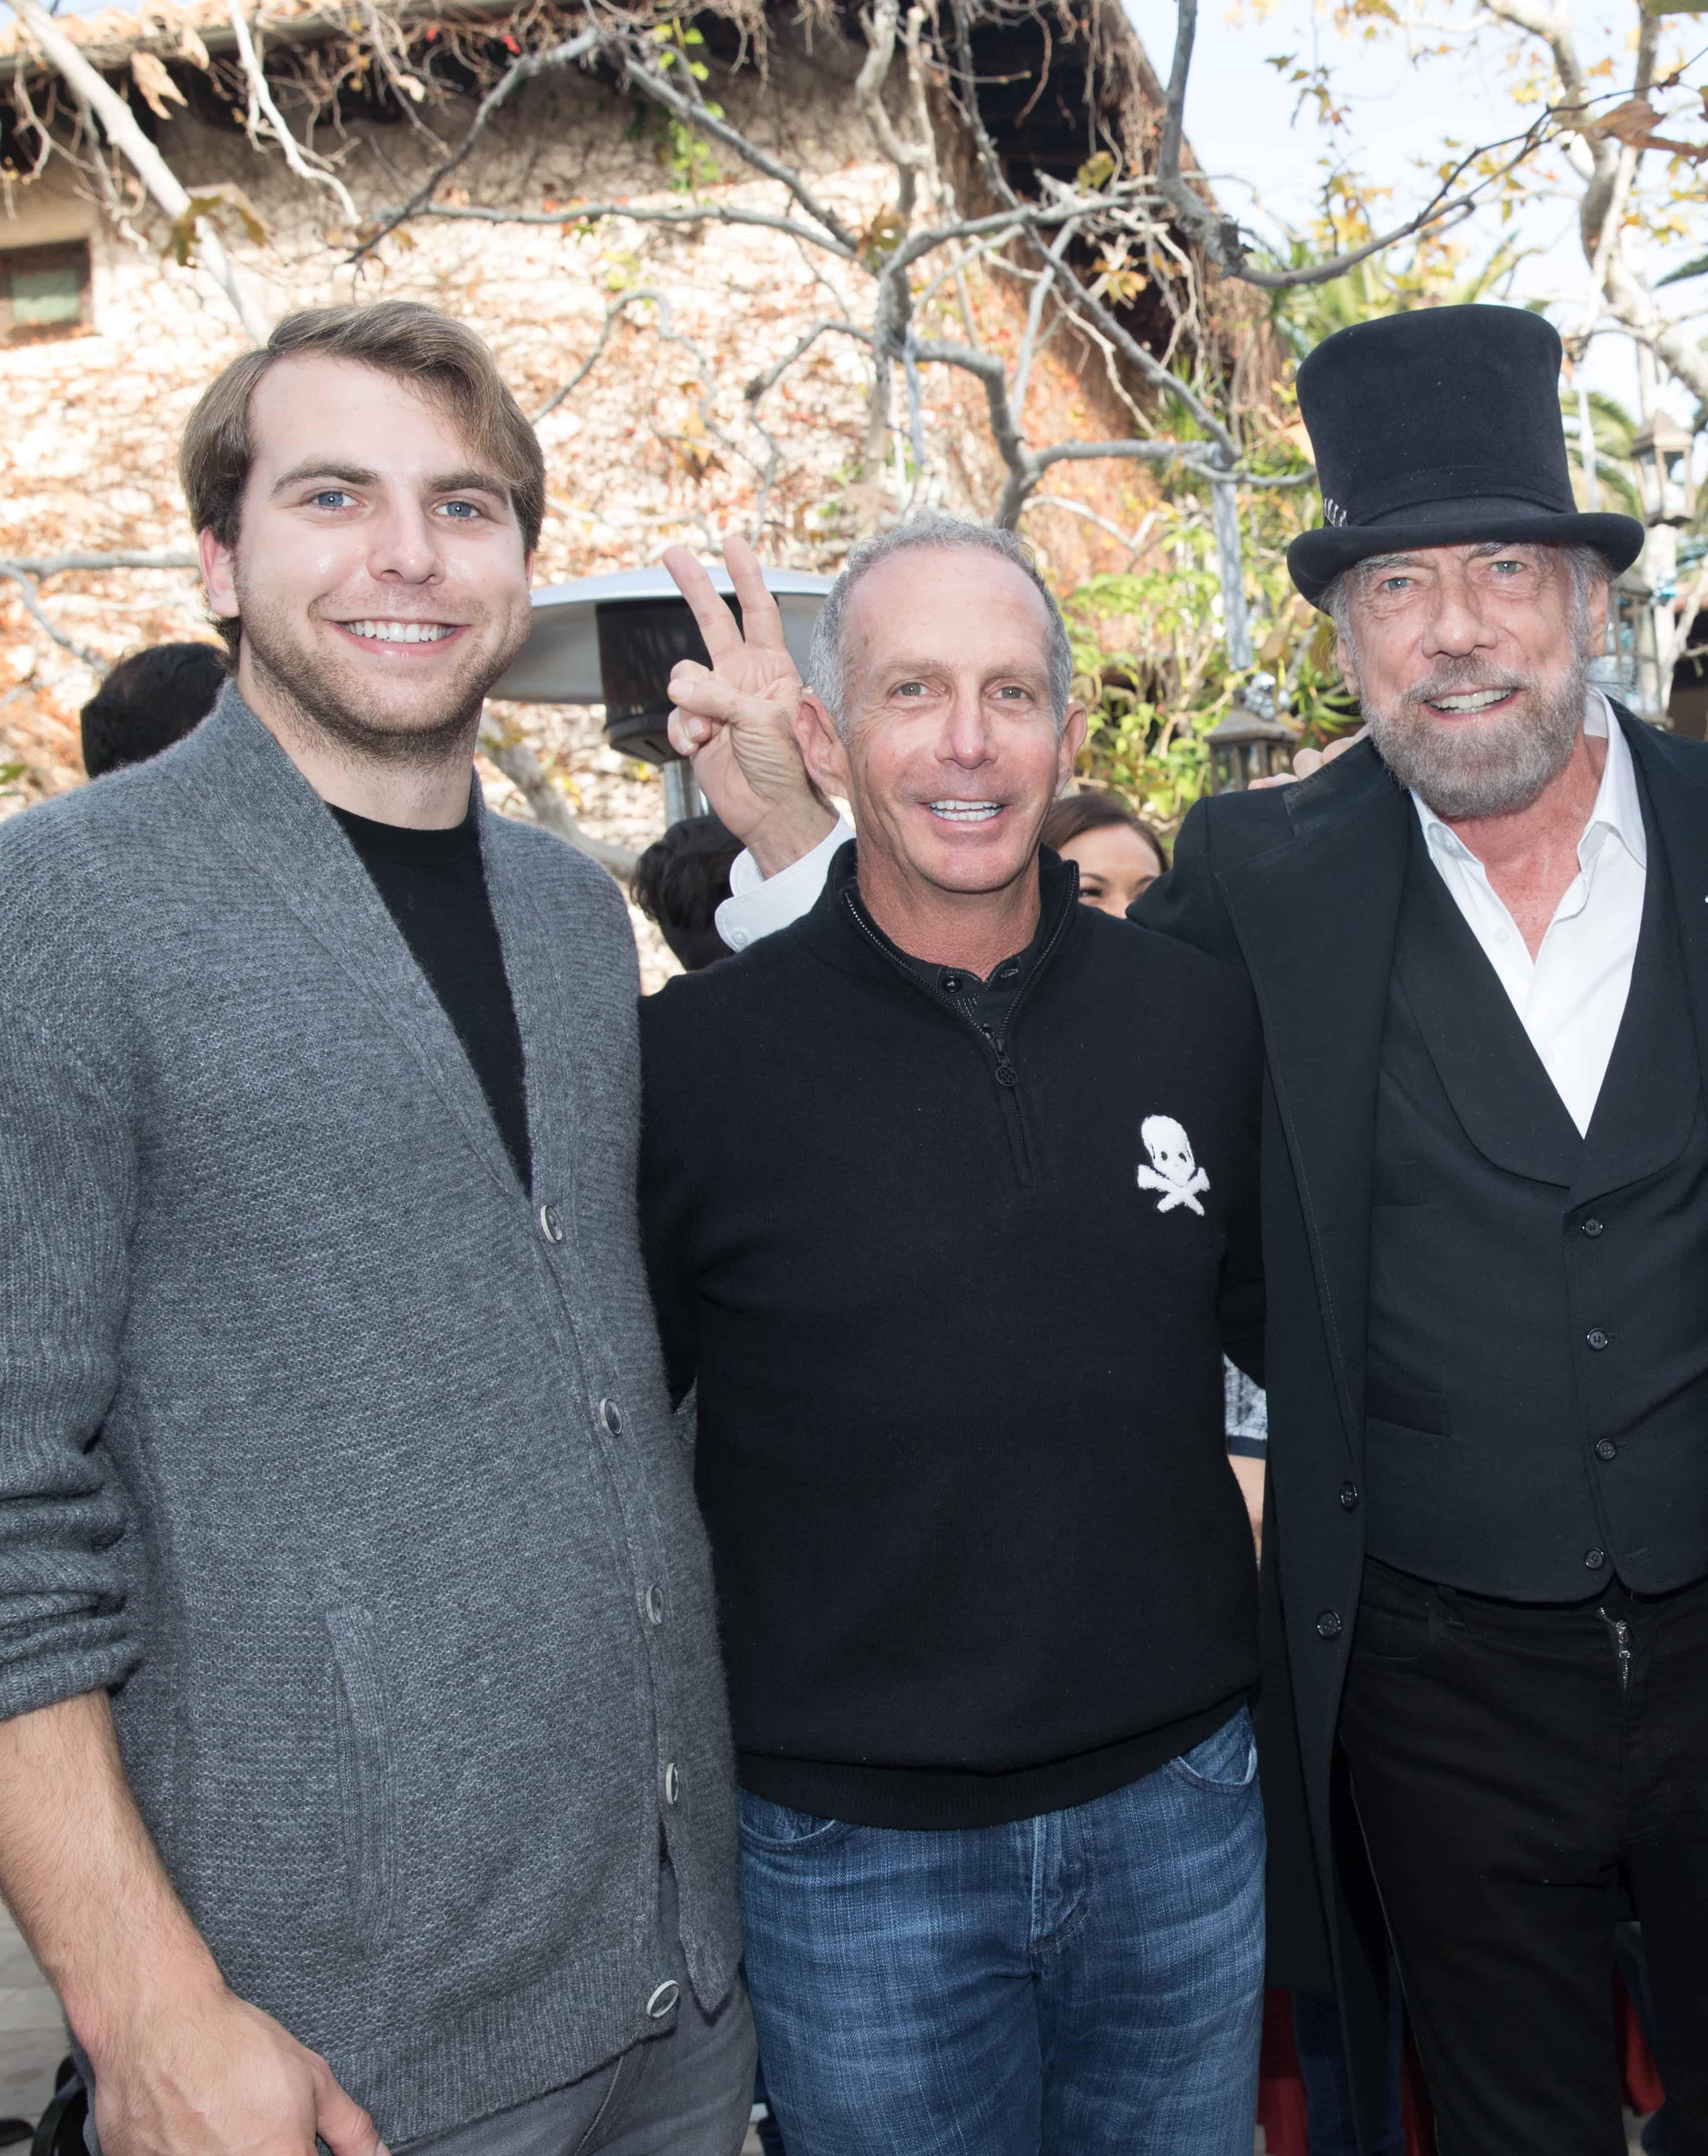 John Anthony DeJoria, Ed Brown and John Paul DeJoria